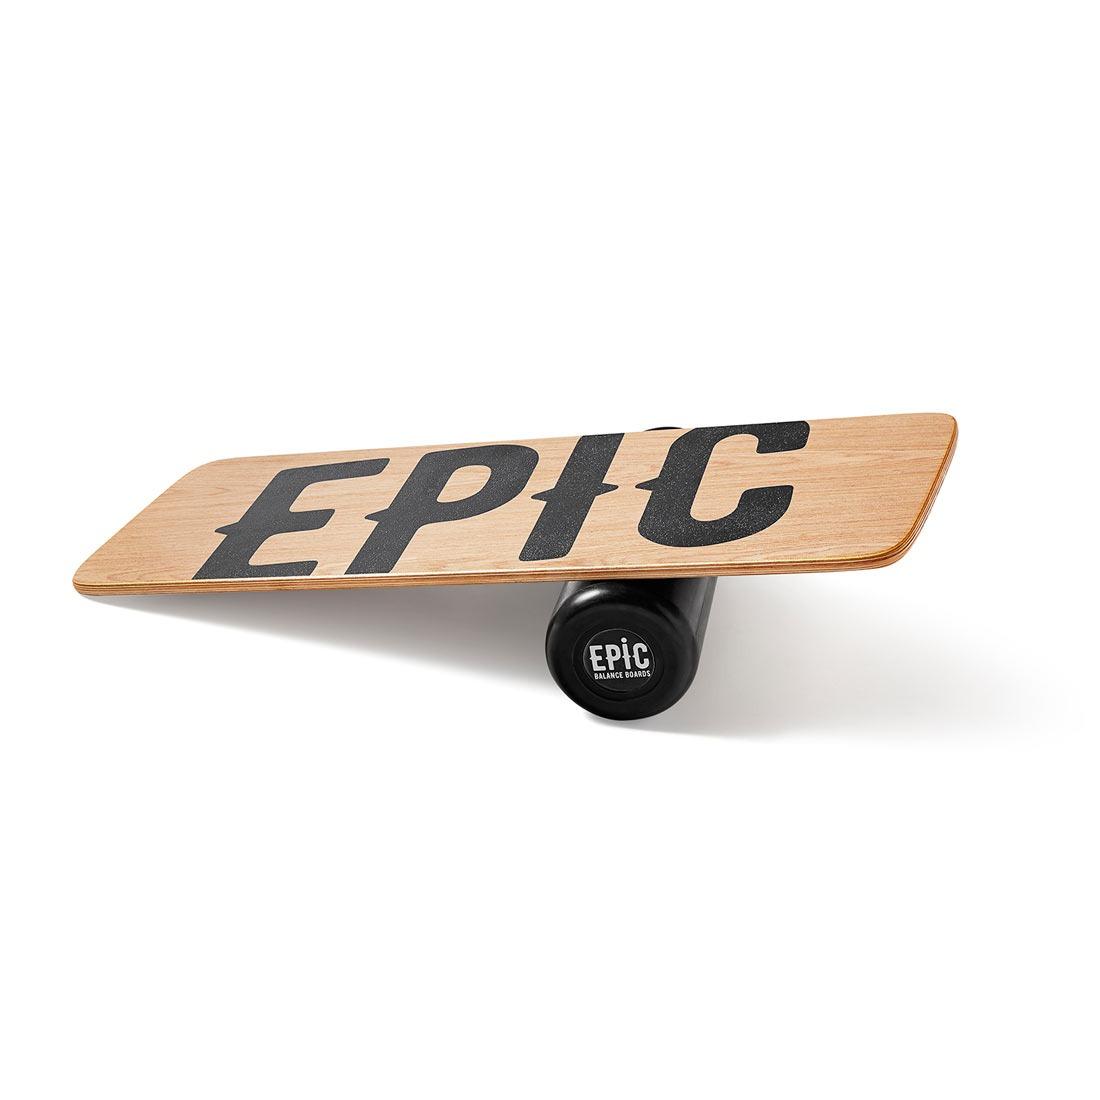 epic-balance-boards-wood_series-baltica